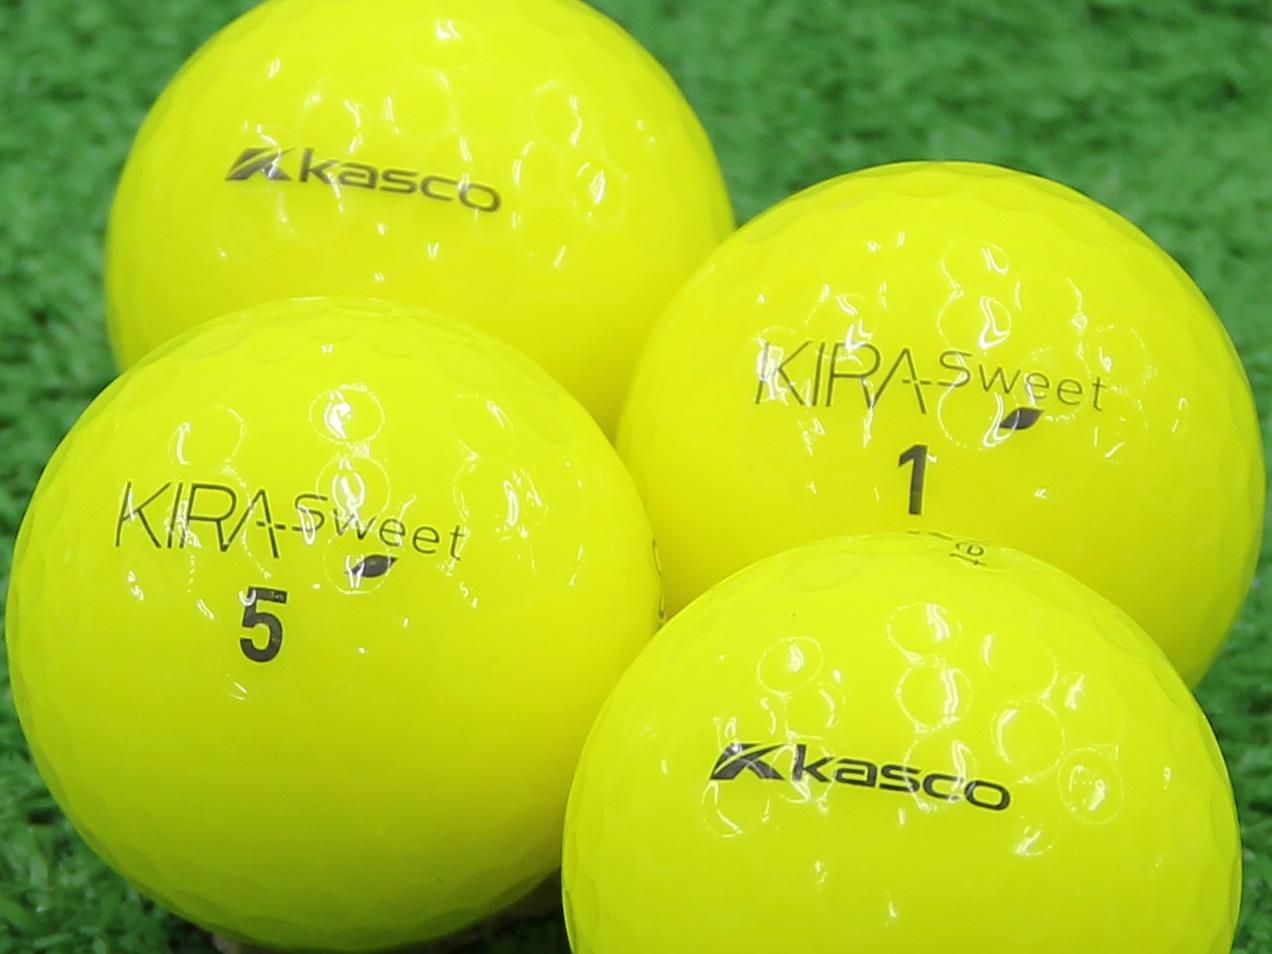 【Aランク】Kasco(キャスコ) KIRA Sweet イエロー 2013年モデル 1個